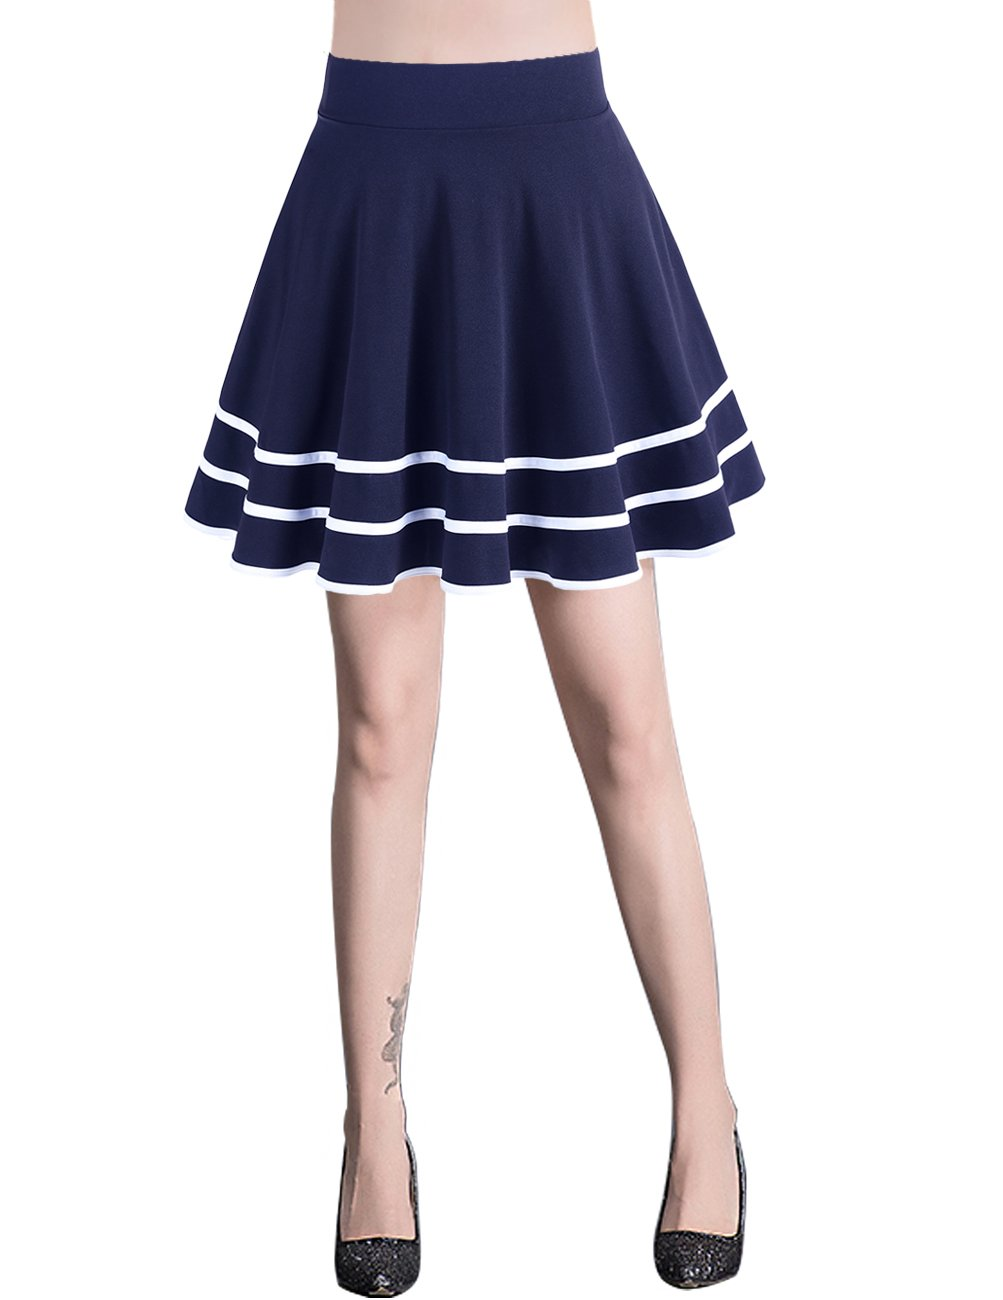 Bridesmay Women's Basic High Waist Casual Mini Skirt Stretchy Skirt